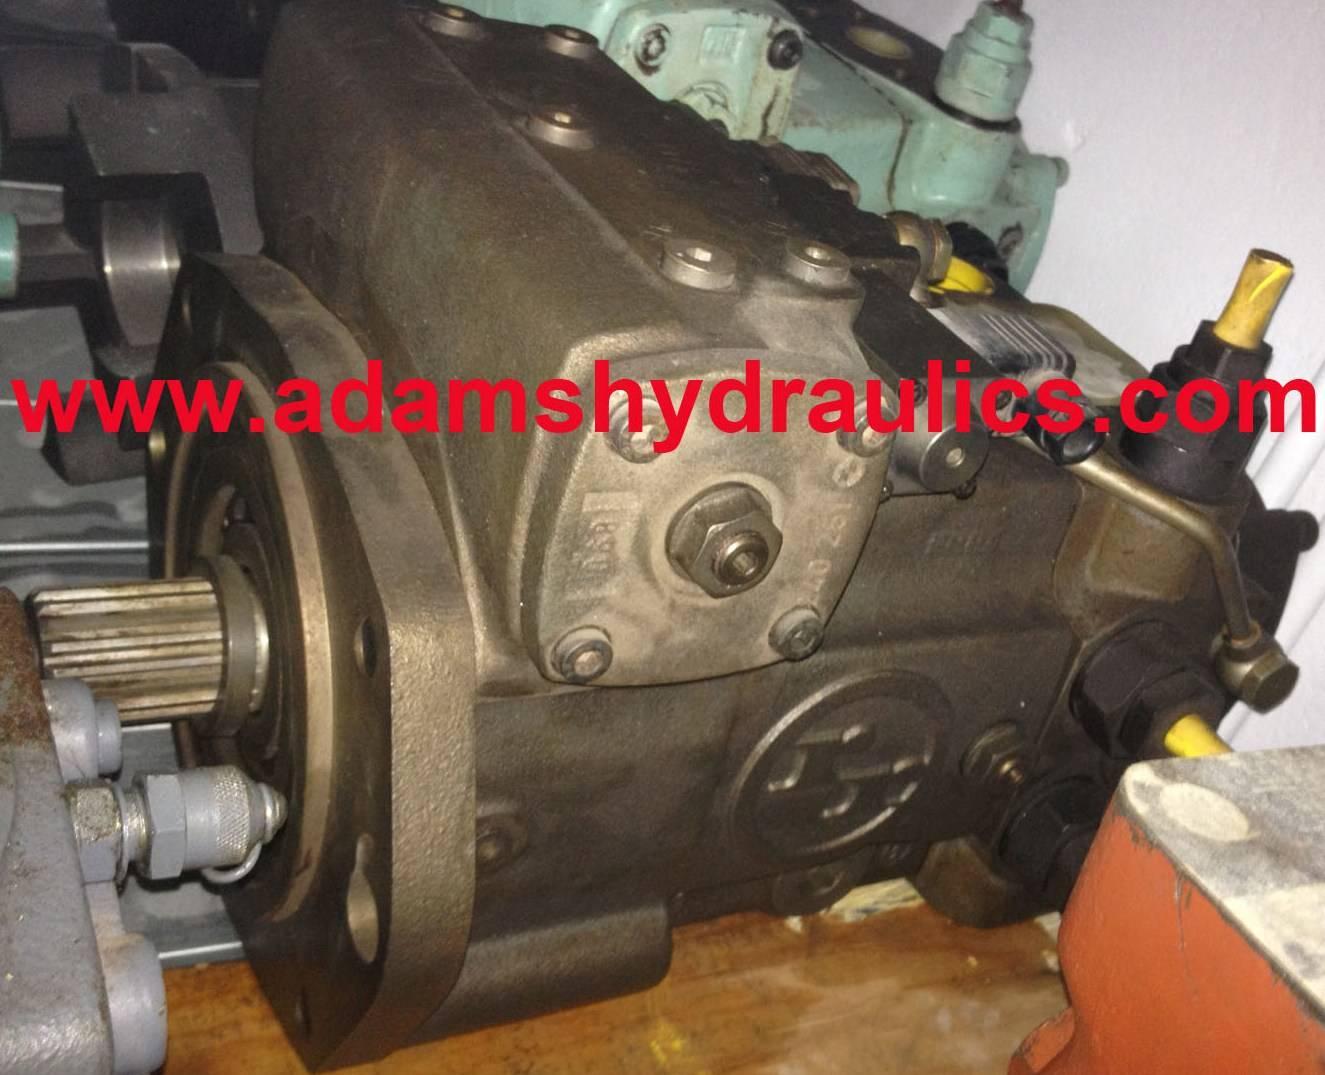 Hydromatik A4V125 Pumps ADAMS Hydraulics